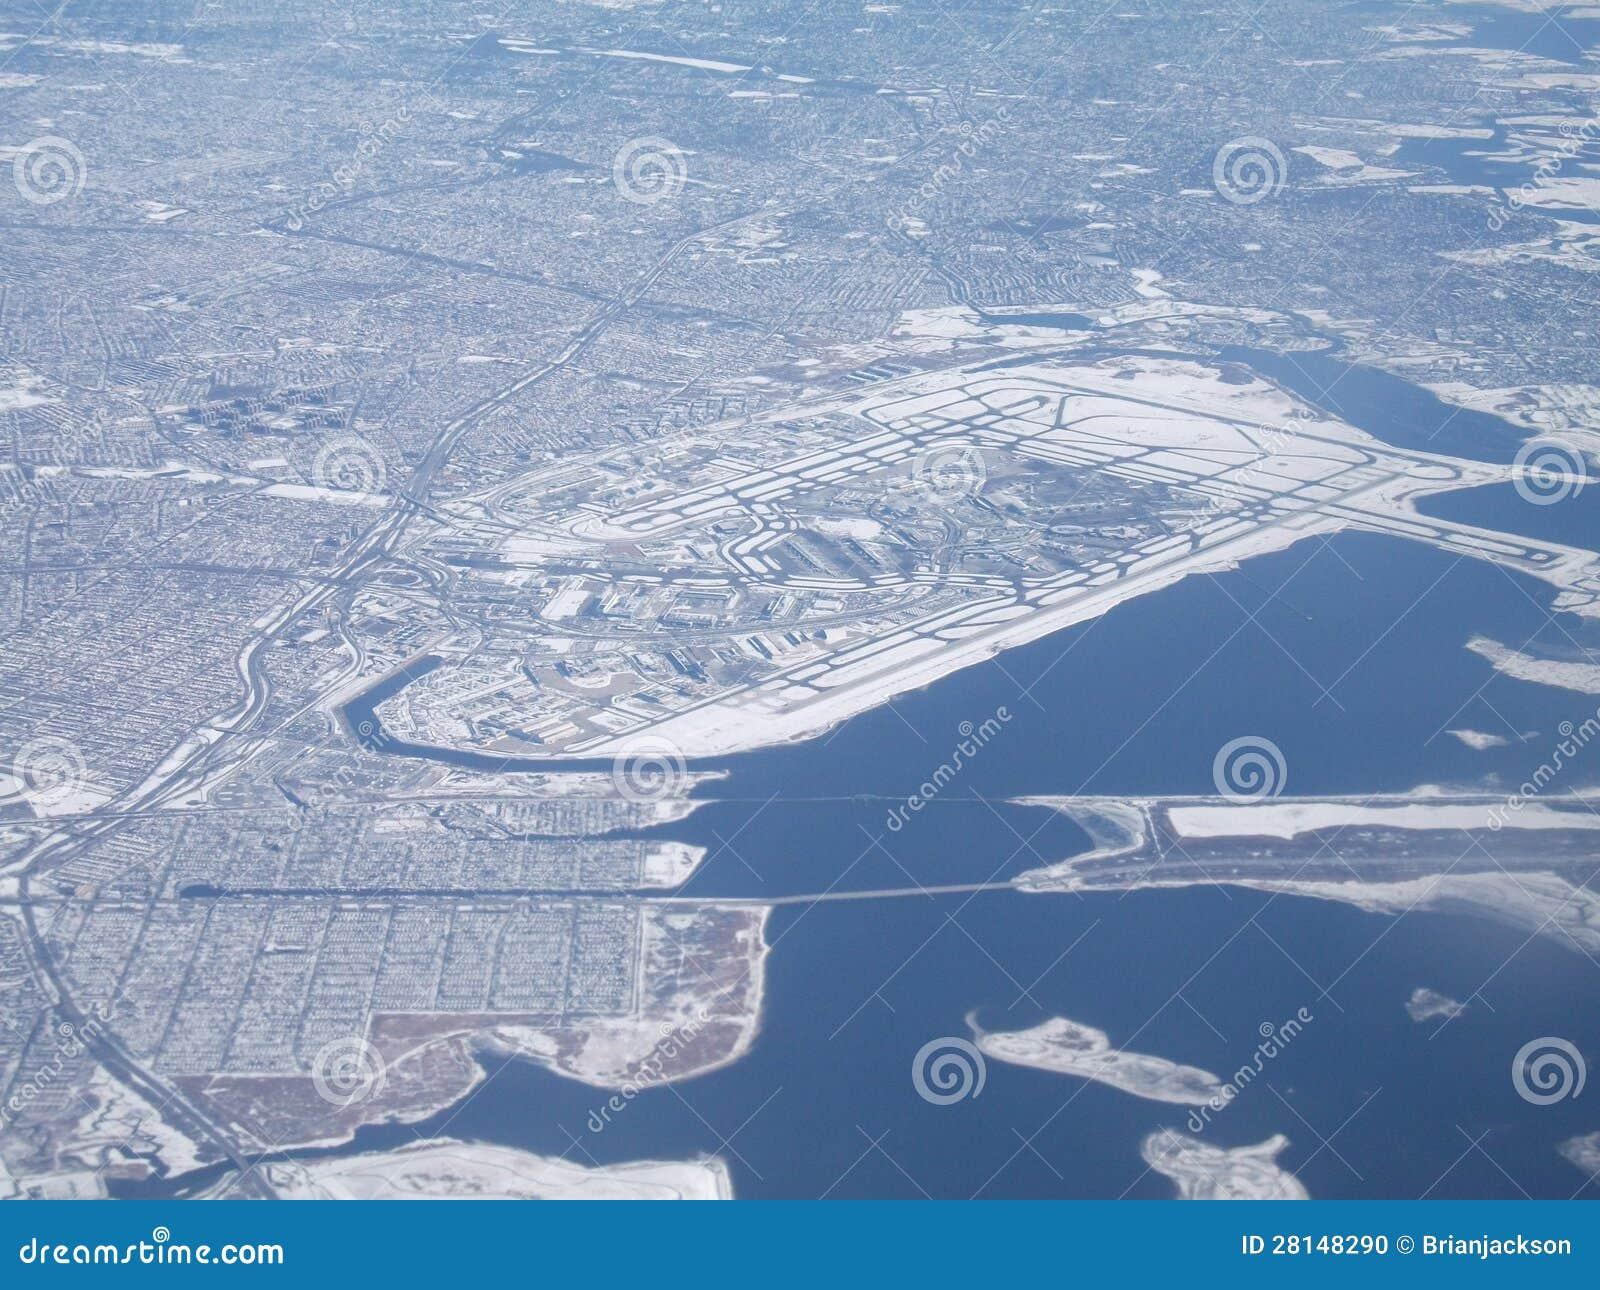 Aeroporto Jfk : New york city jfk airport in winter from air stock photo image of